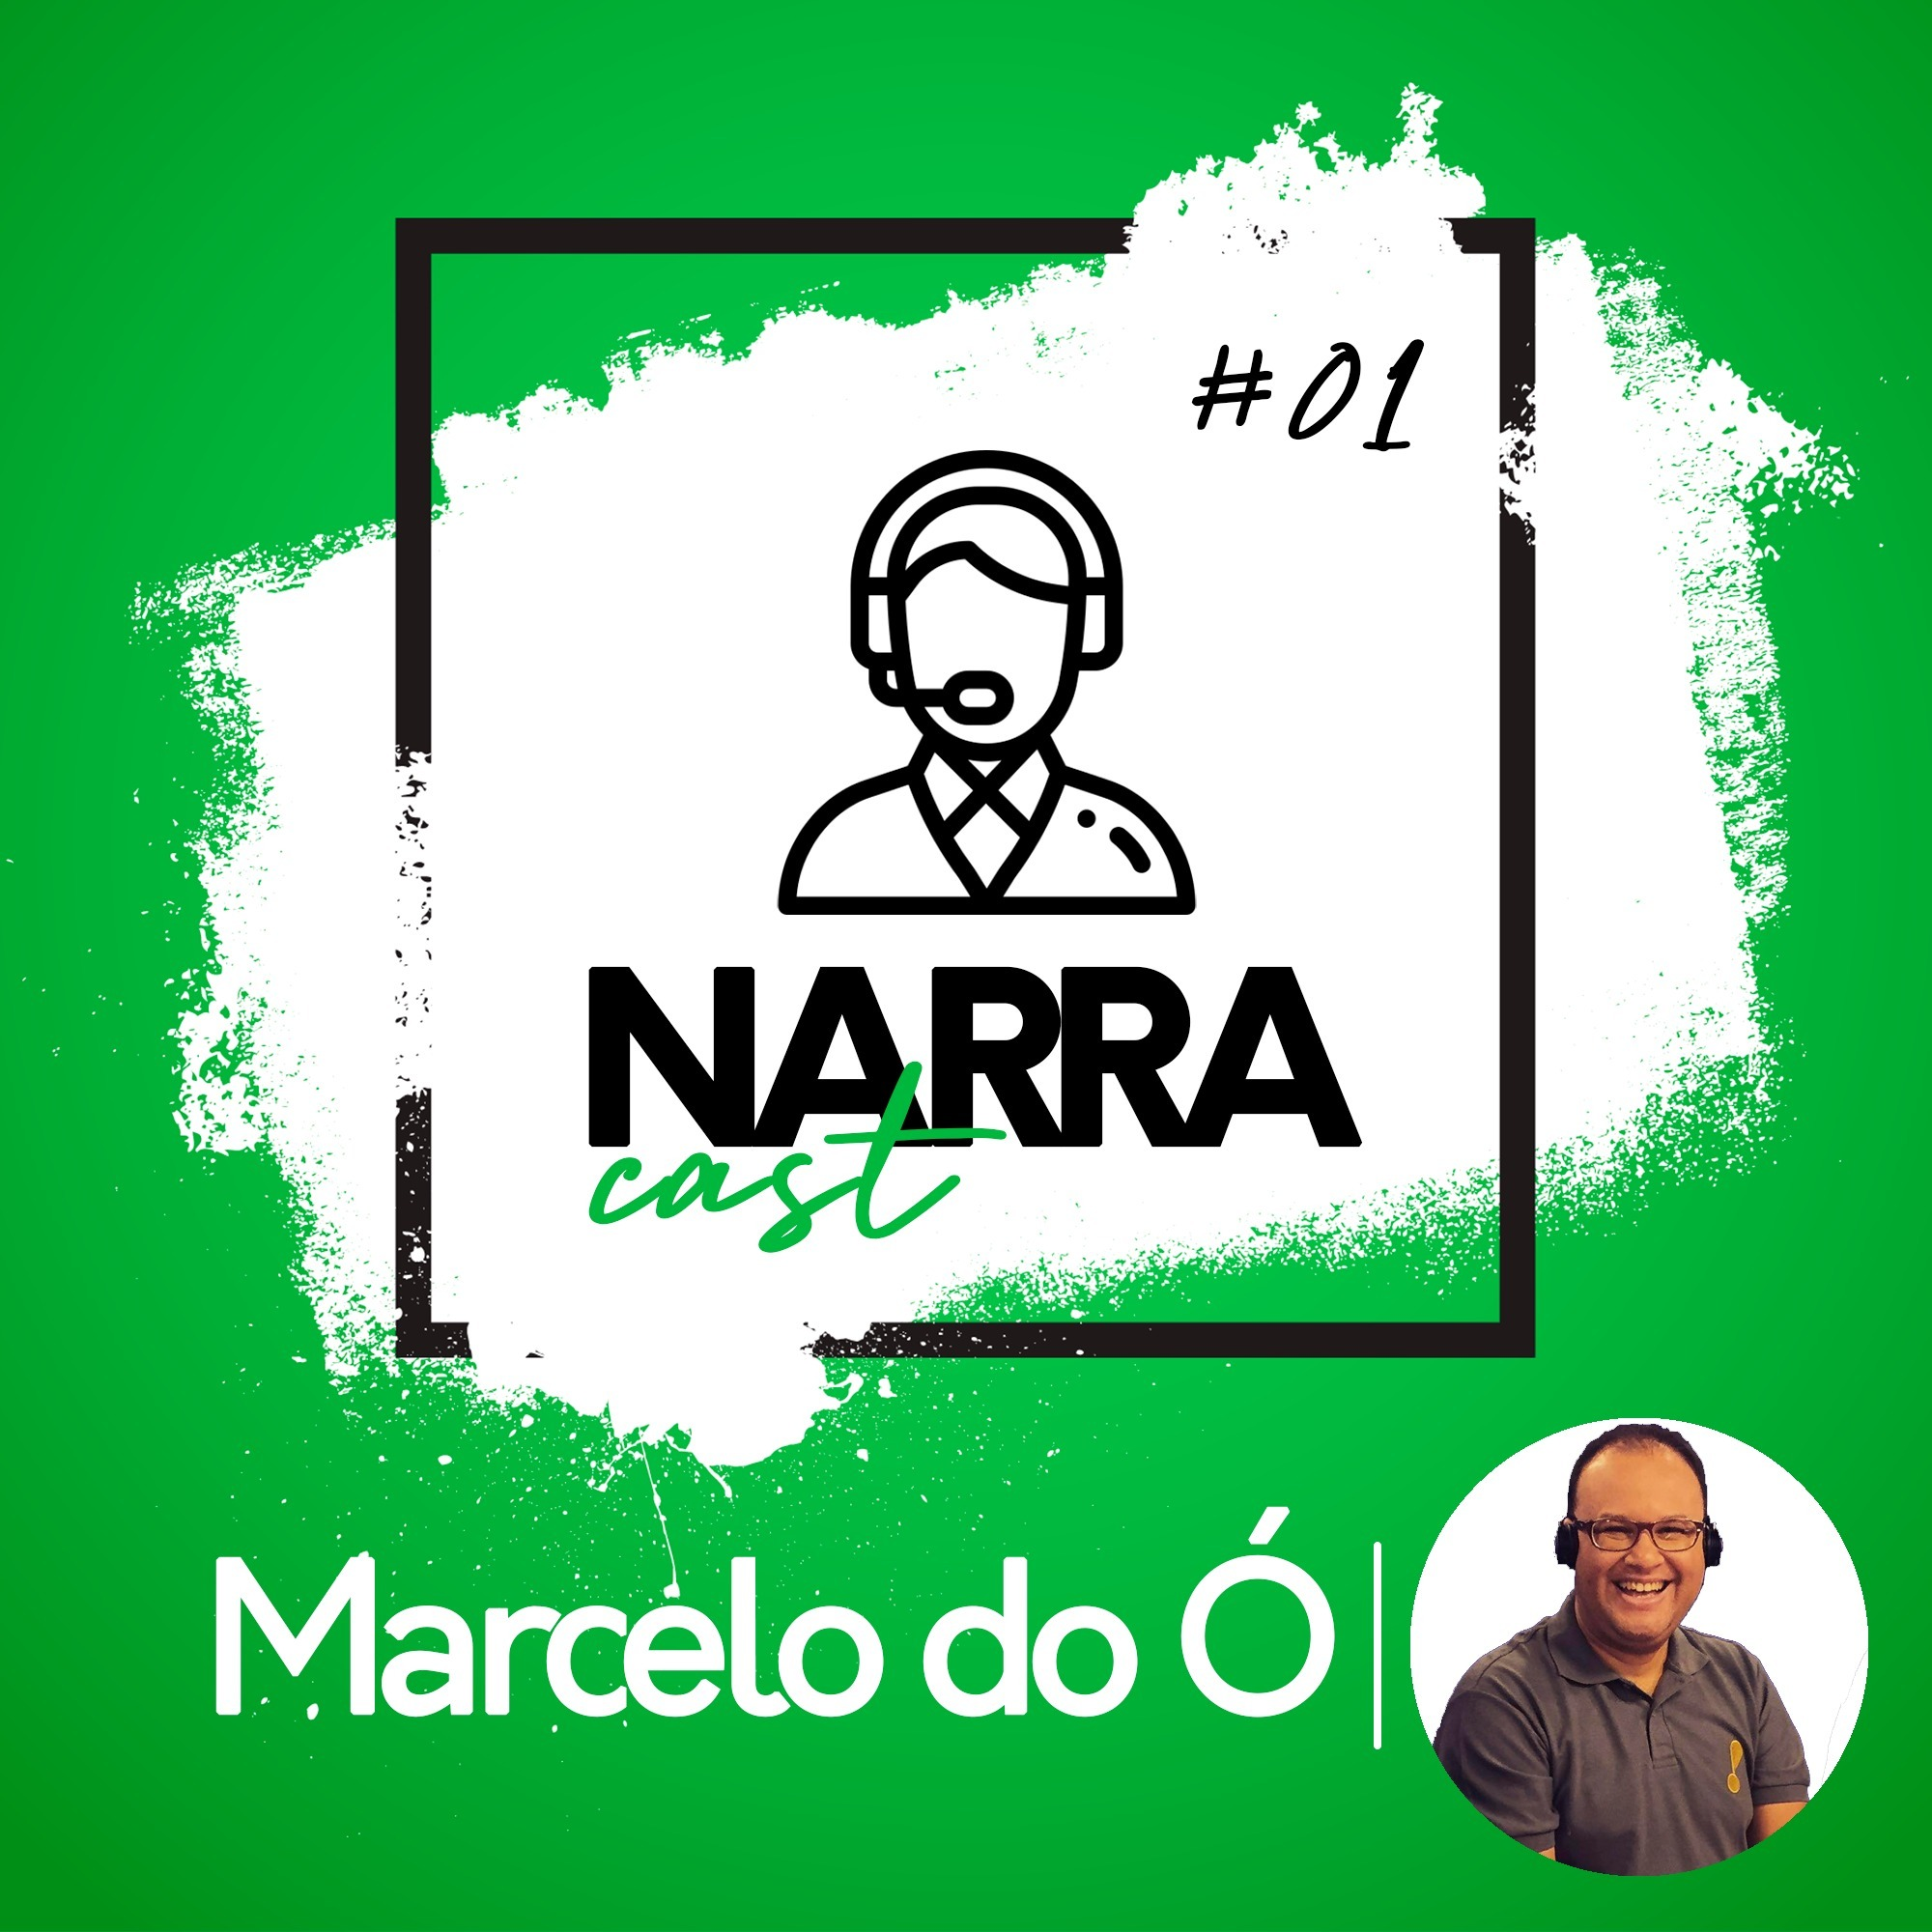 NarraCast #01 Marcelo do Ó